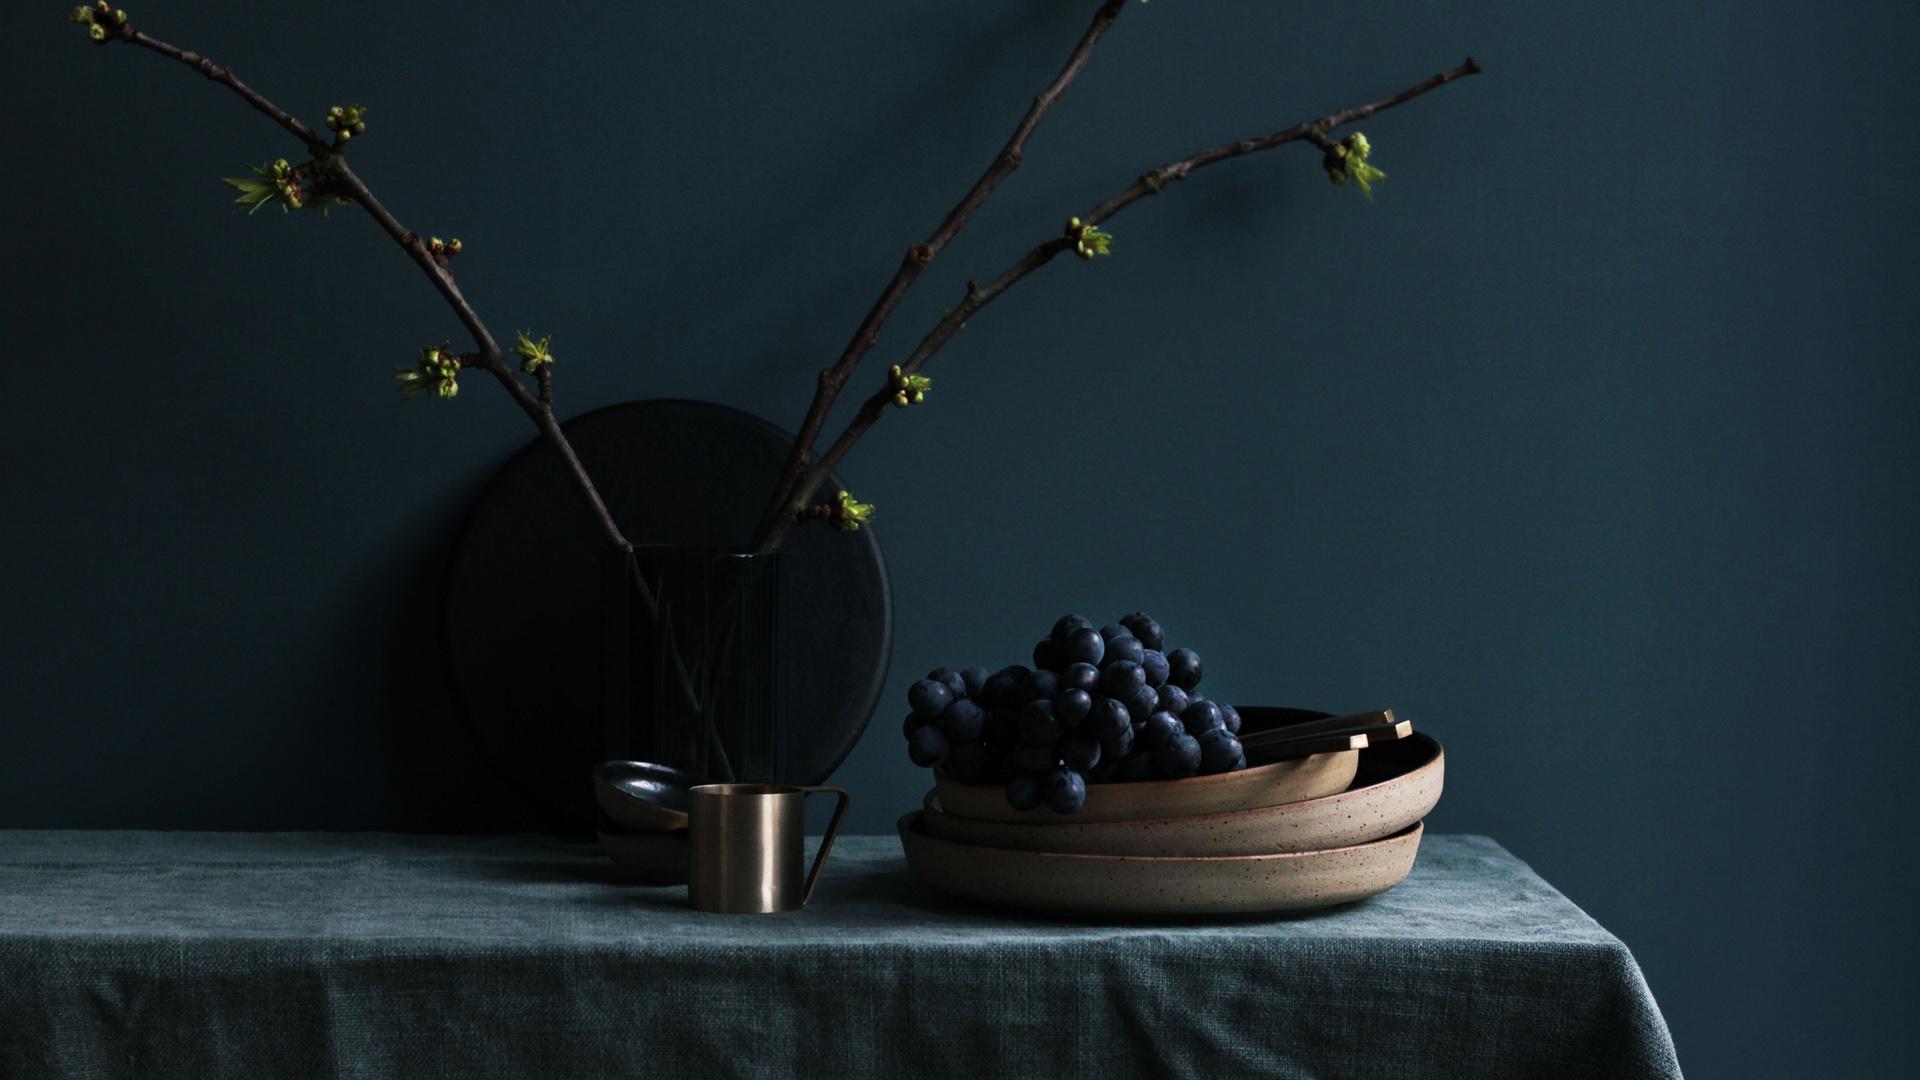 jc herman ceramics piedi zwart amsterdam fotografie